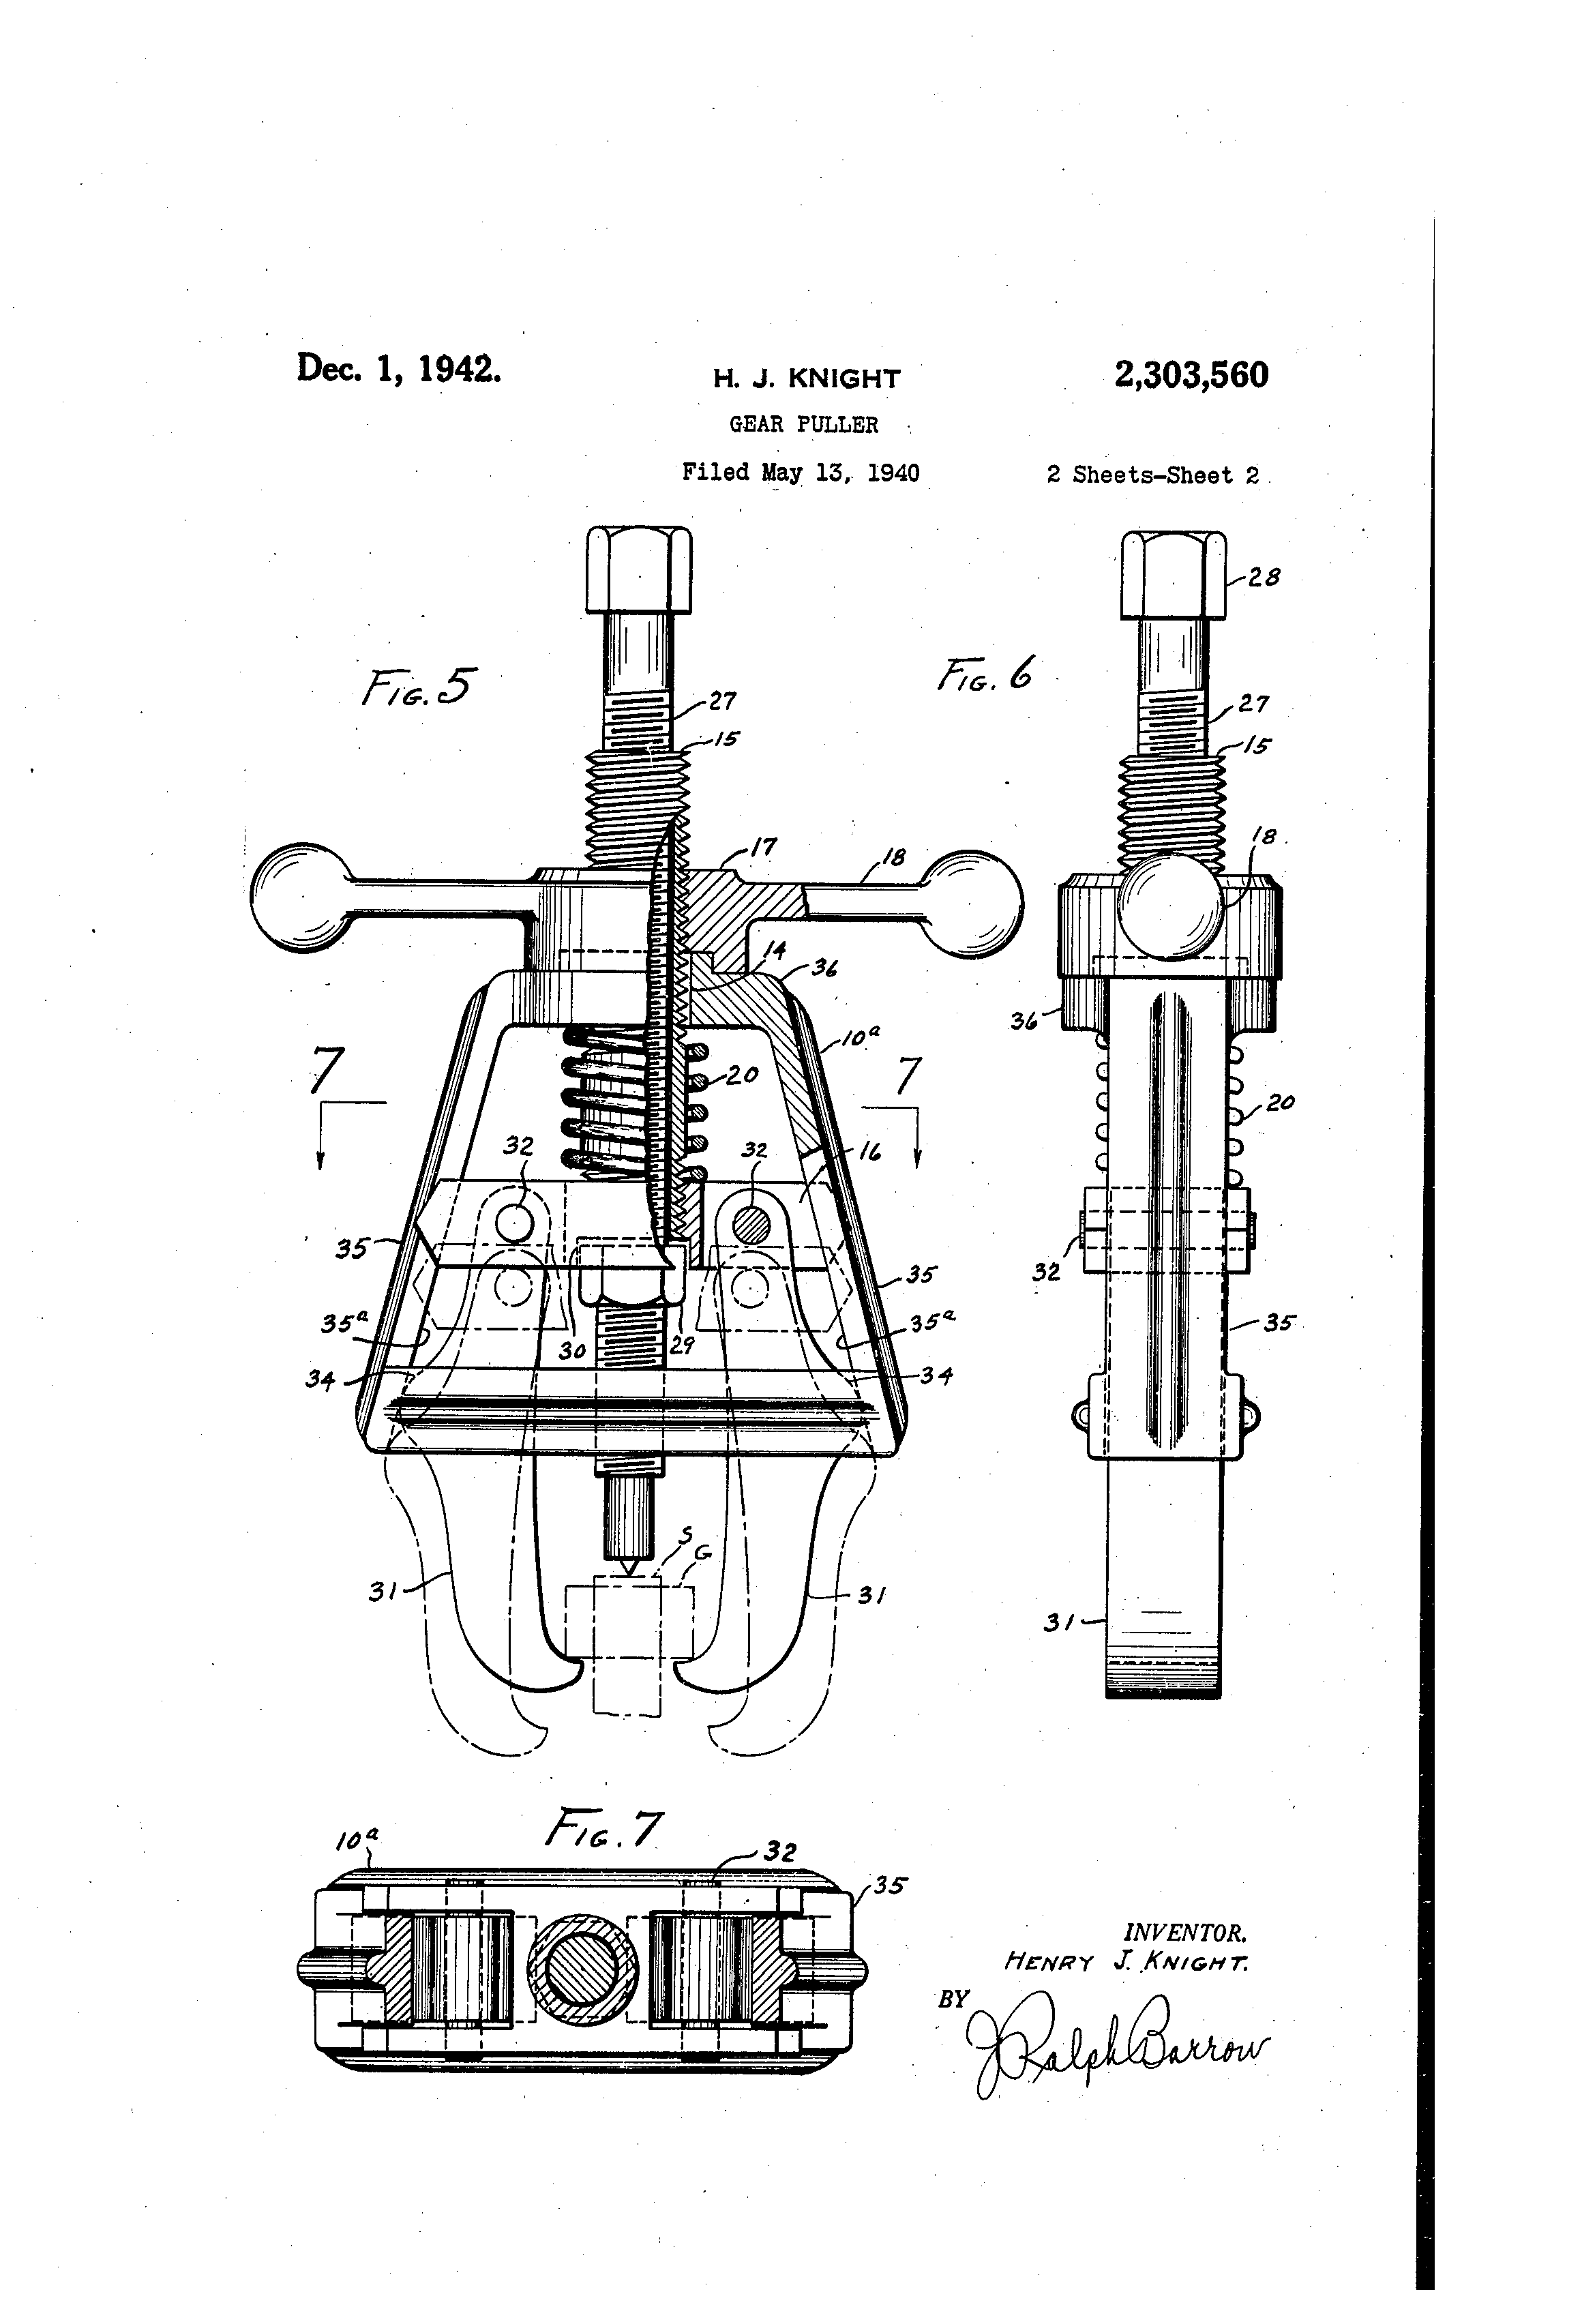 Bearing Puller Diagram : Patent us gear puller google patents